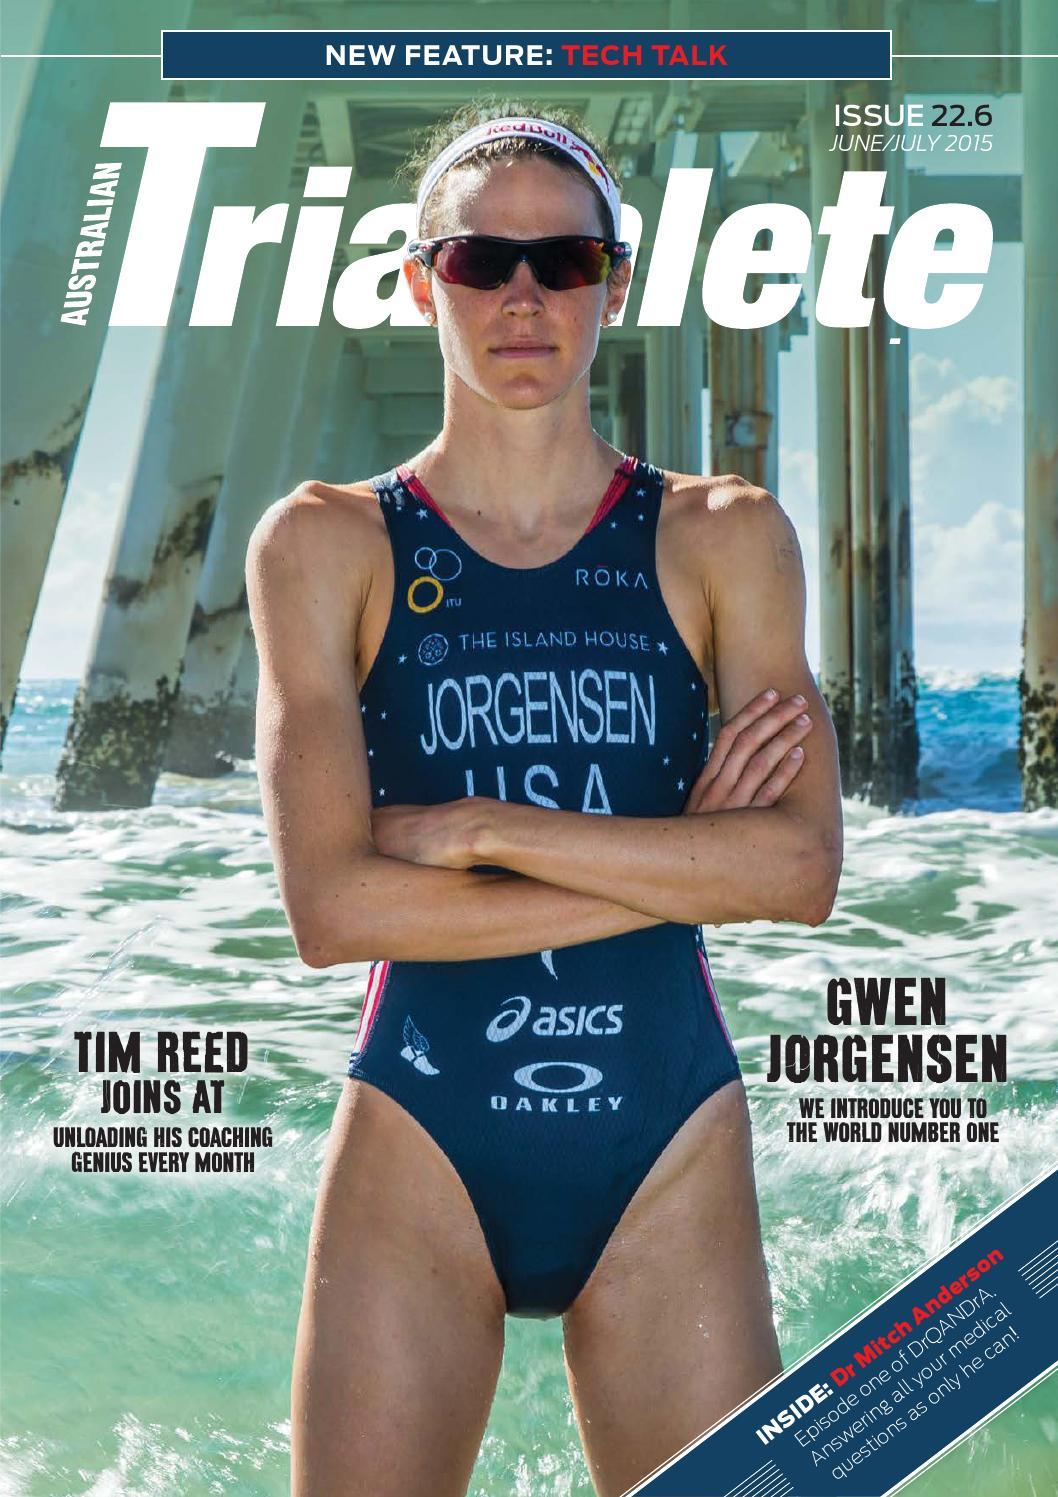 28 30 Speedo Racer Brief Swimsuit Practice Competition Triathalon Swim $44